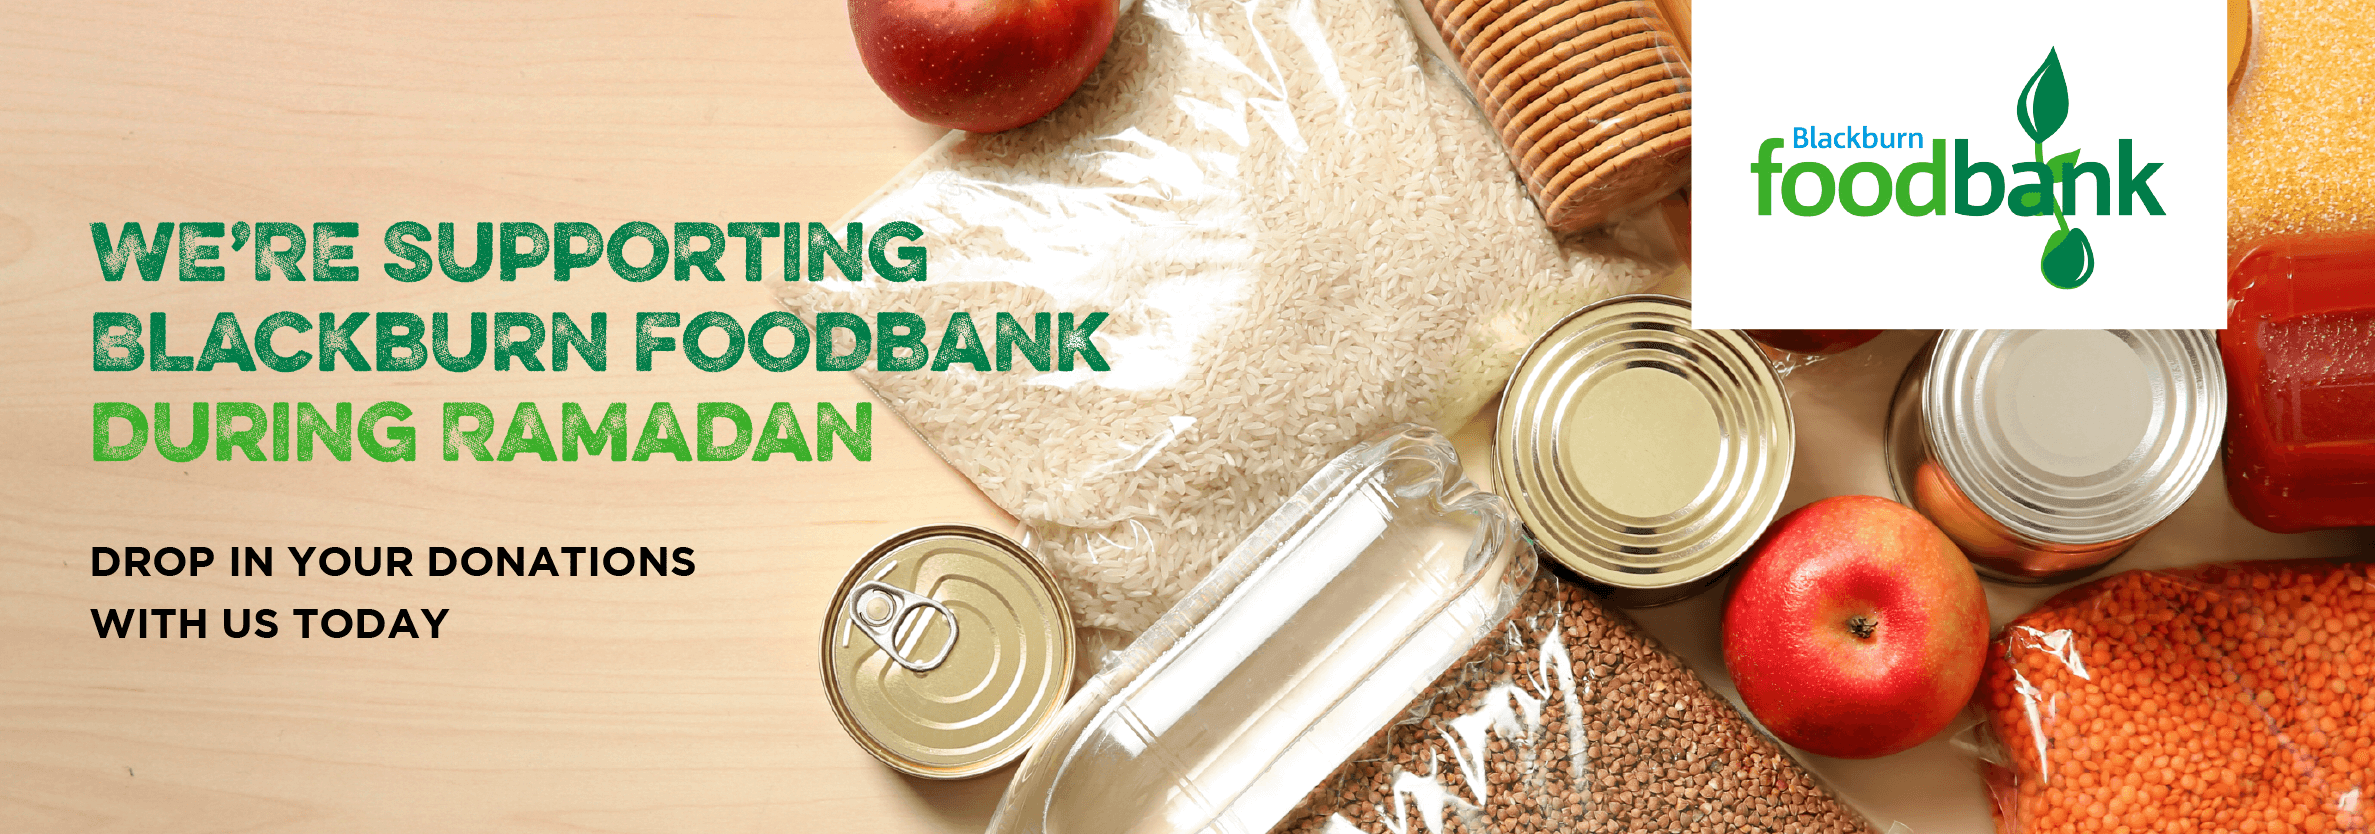 We're Supporting Blackburn Foodbank